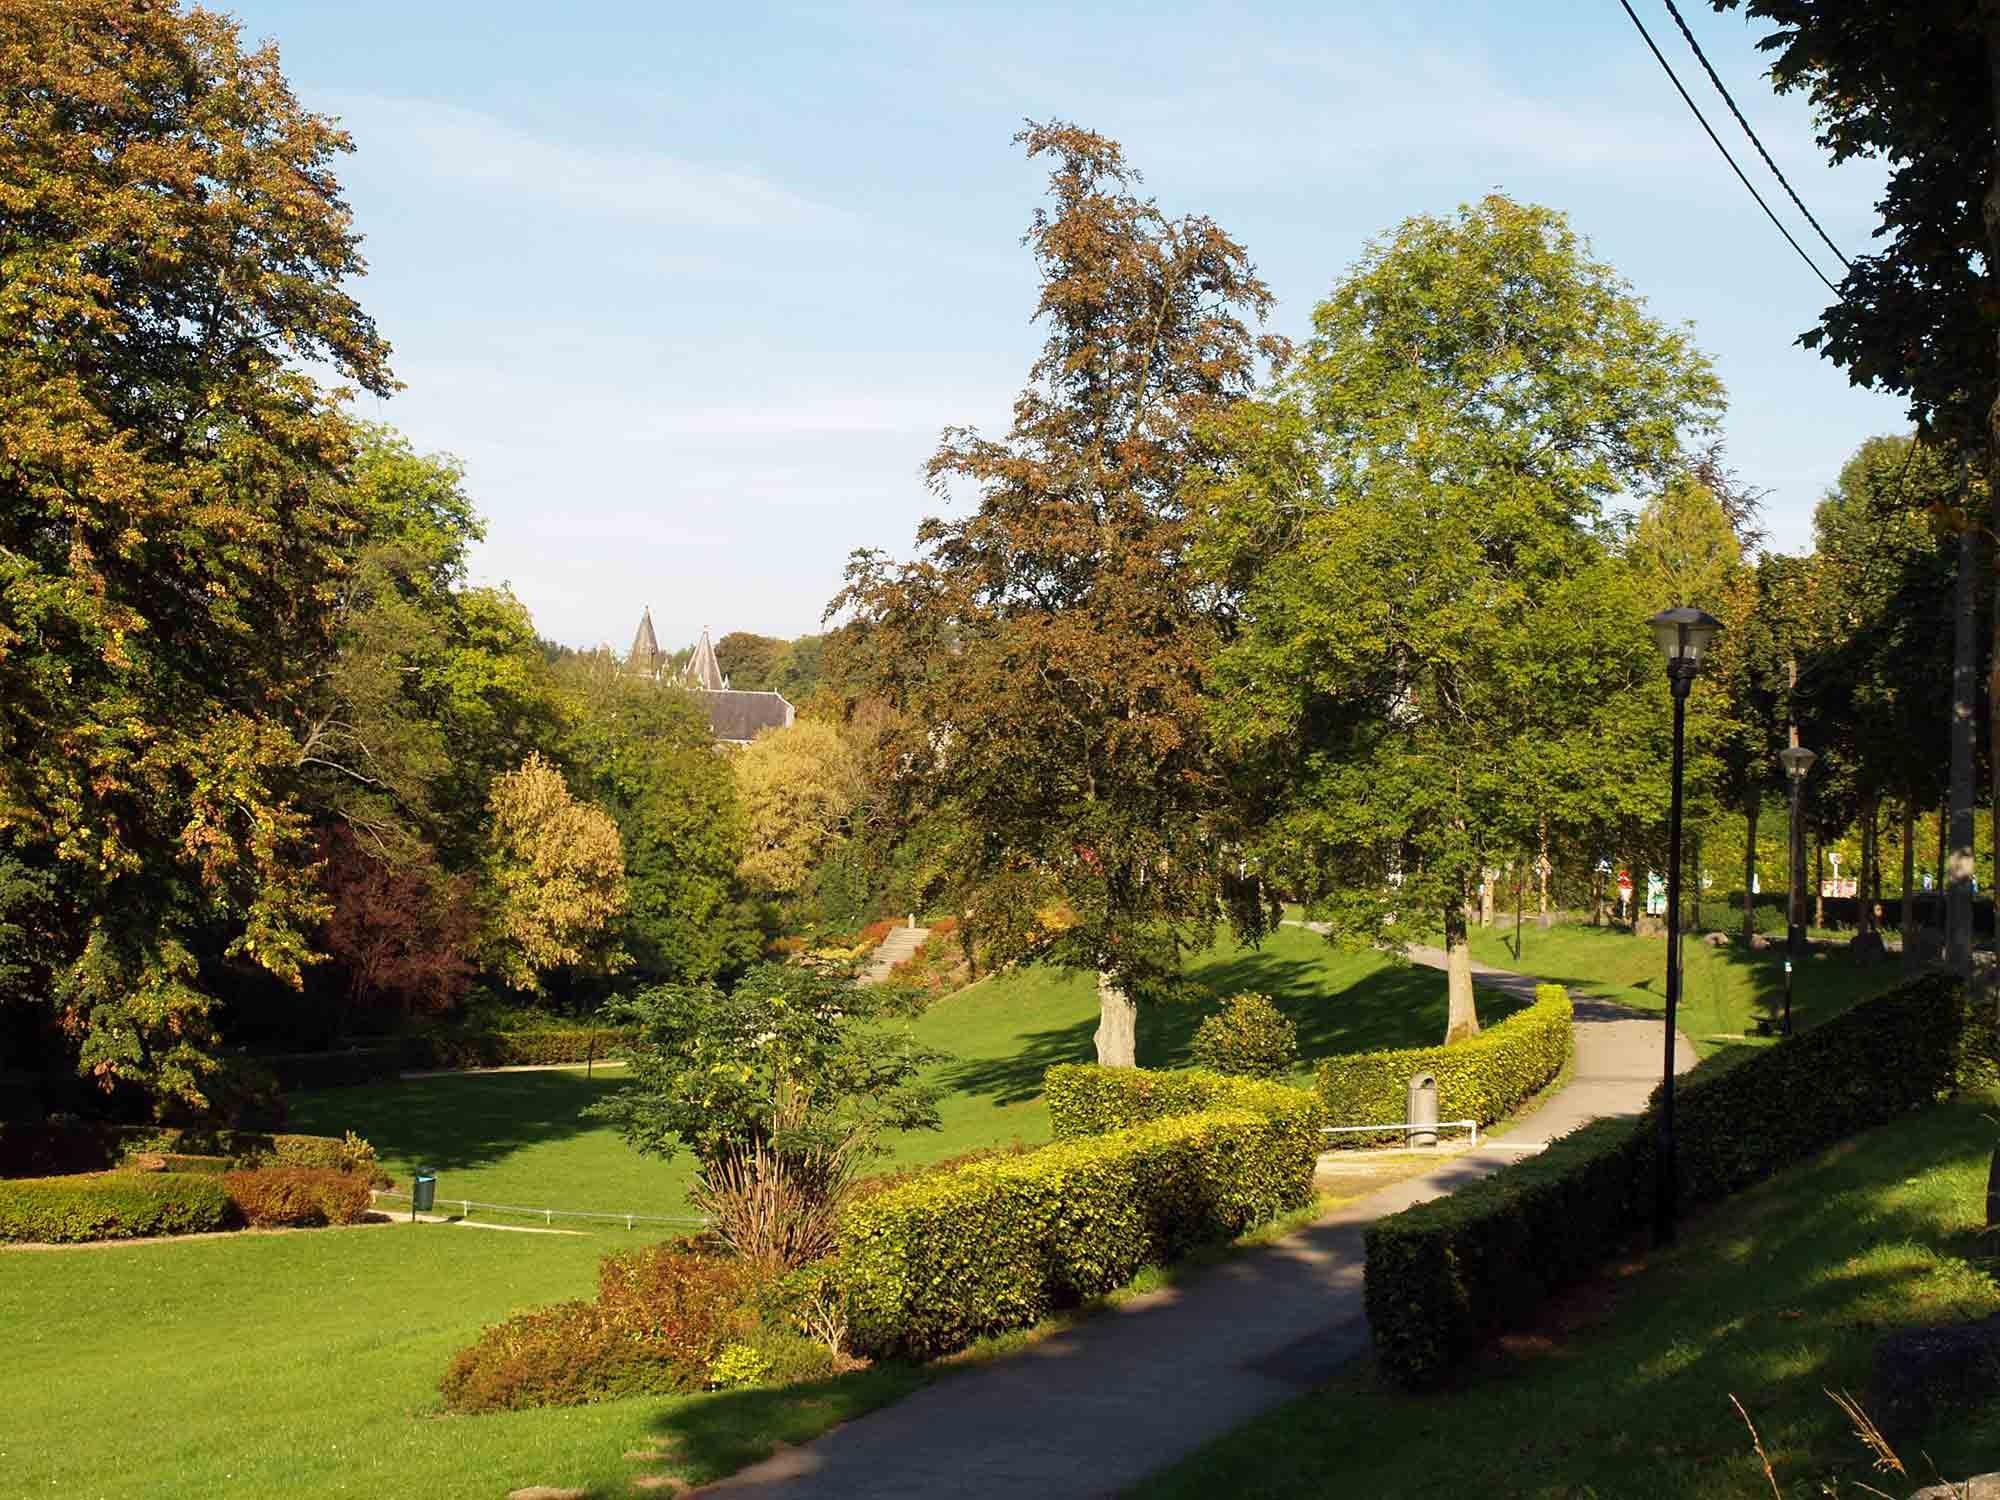 ardenne residences durbuy region landscape city parc